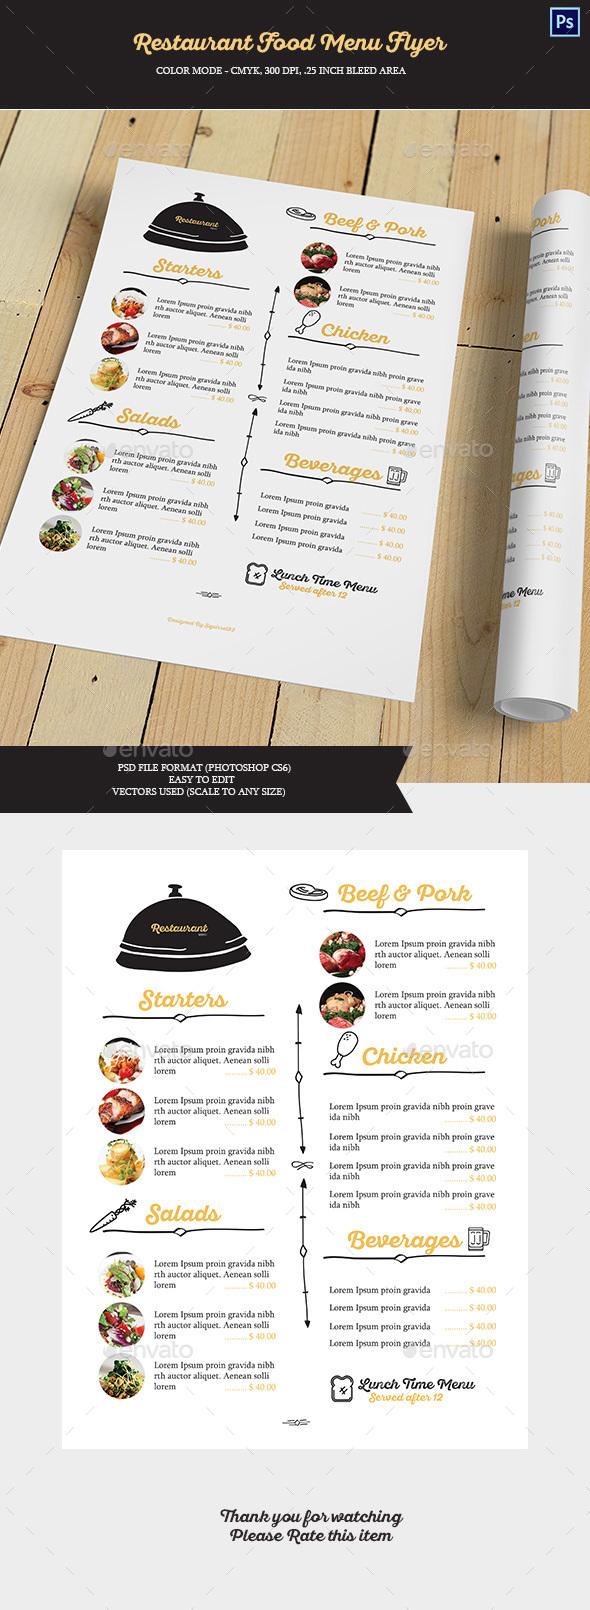 Restaurant Food Menu Flyer - Food Menus Print Templates